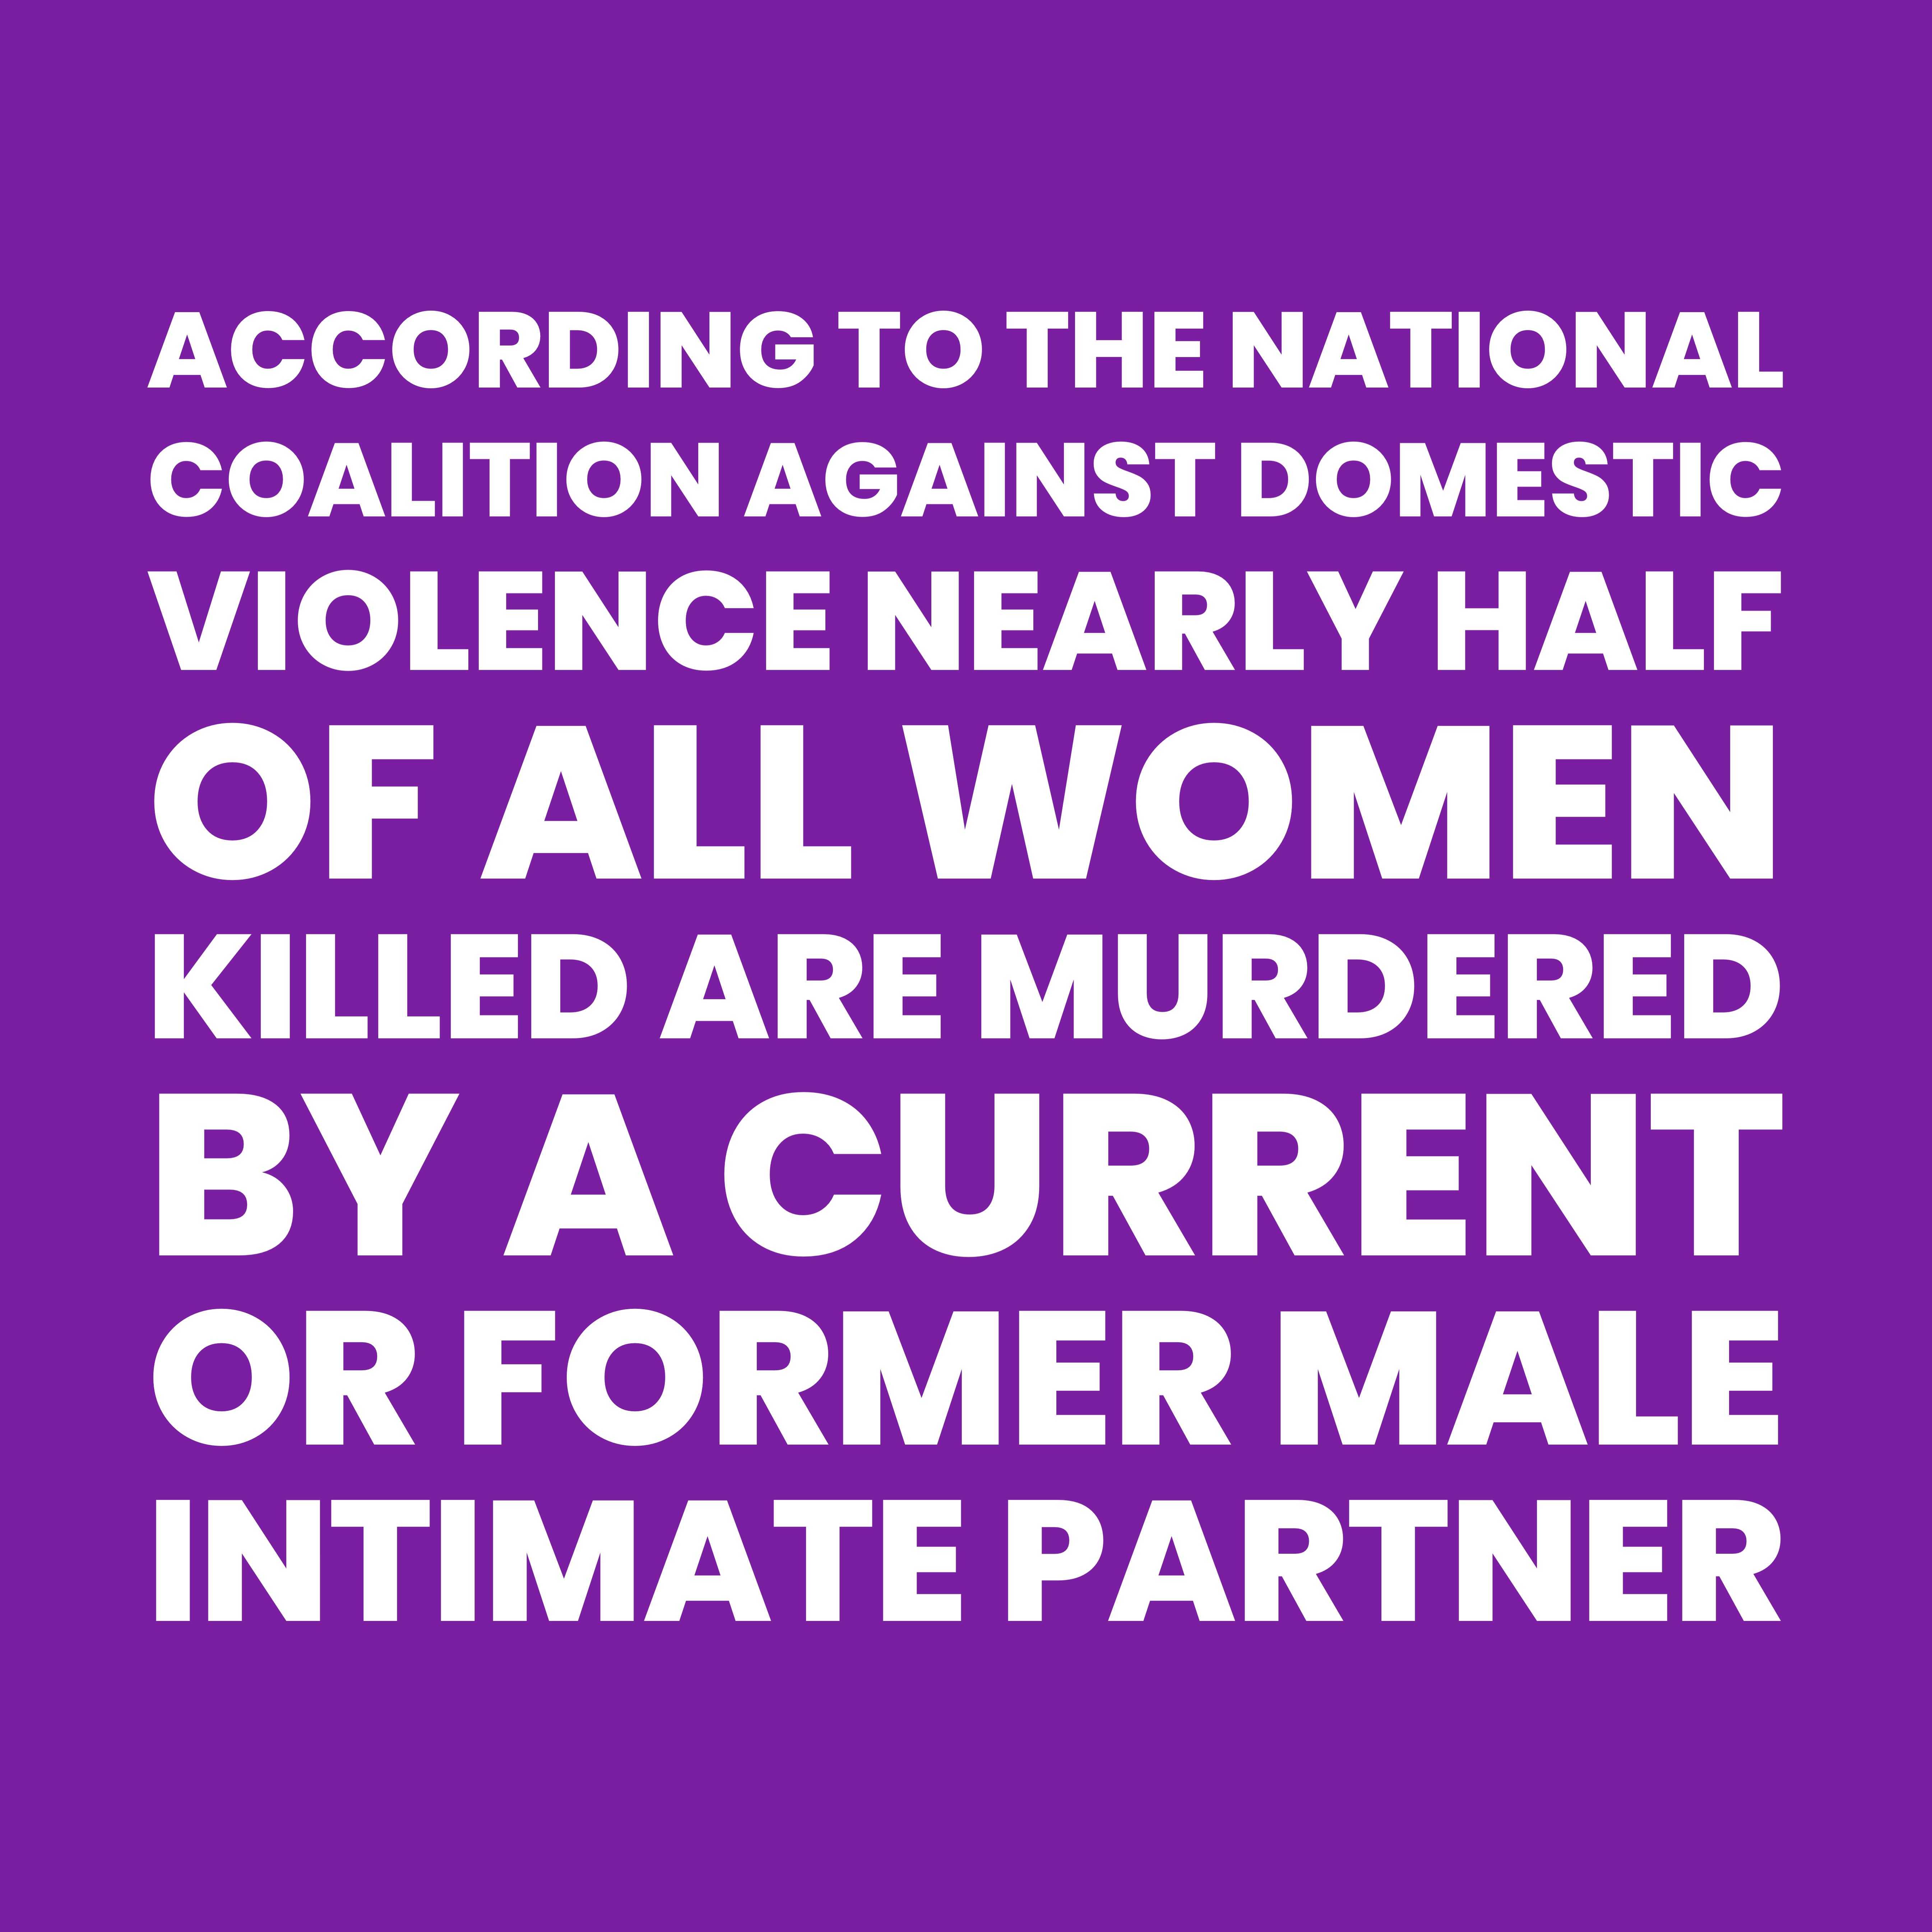 Domestic violence is a public health crisis